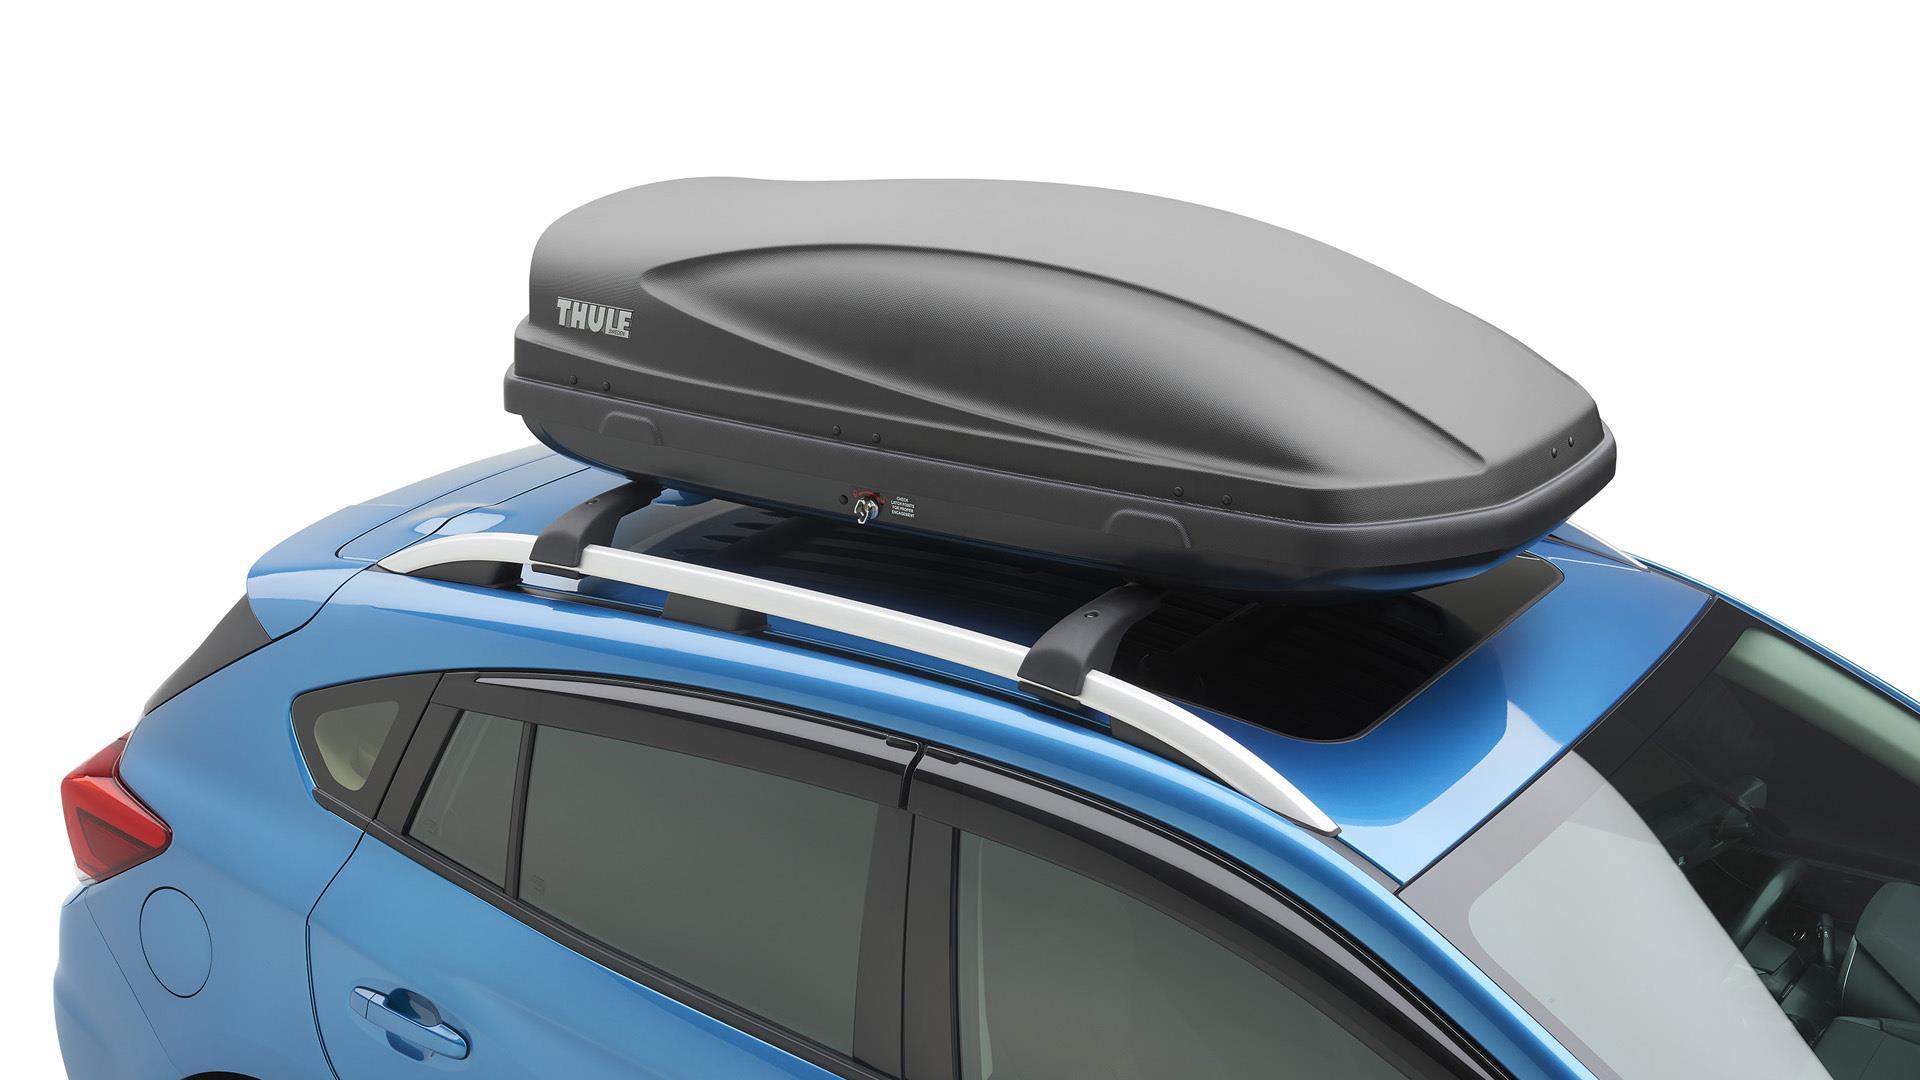 2017 subaru crosstrek thule roof cargo carrier provides. Black Bedroom Furniture Sets. Home Design Ideas